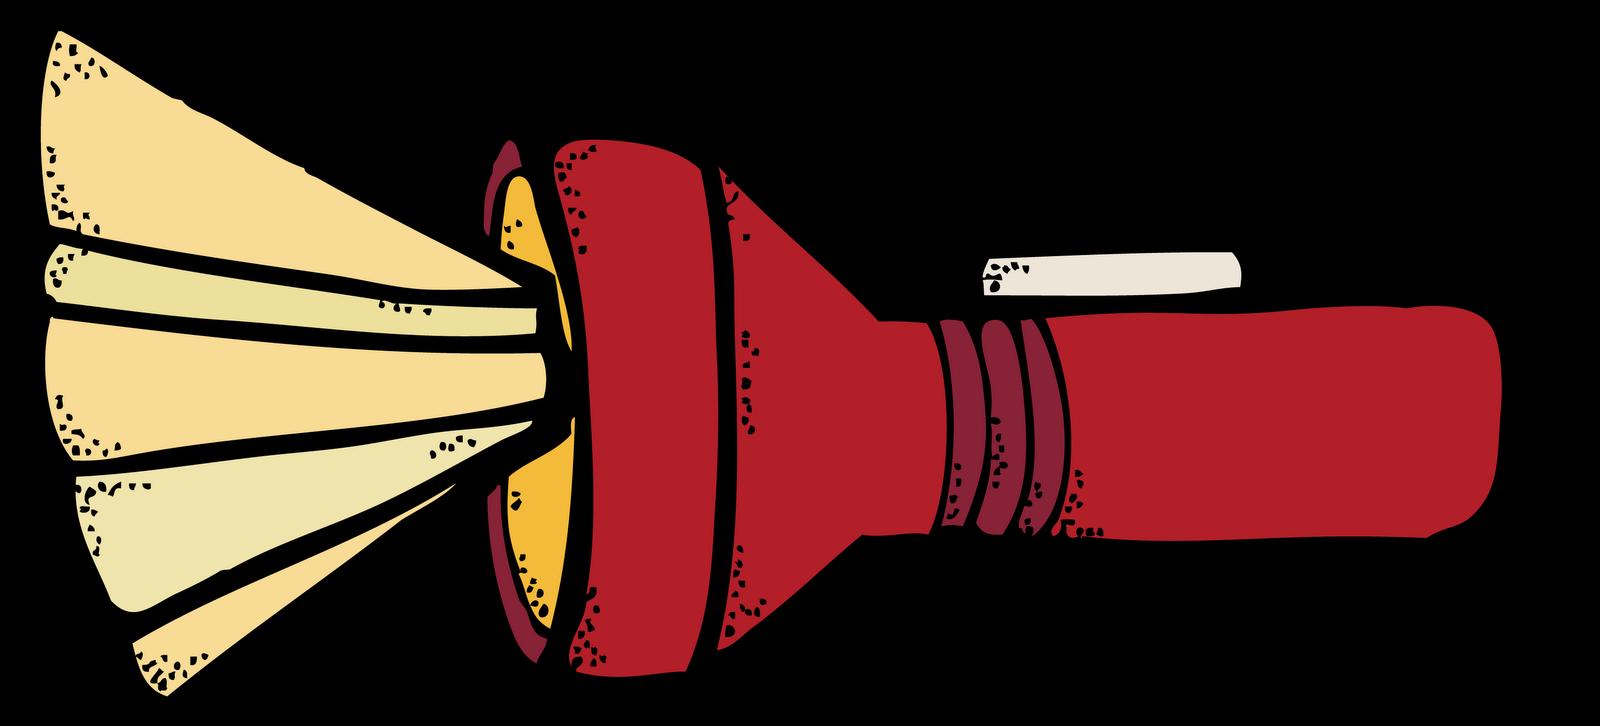 1600x726 Melonheadz Lds Illustrating Girls Camp Illustrations